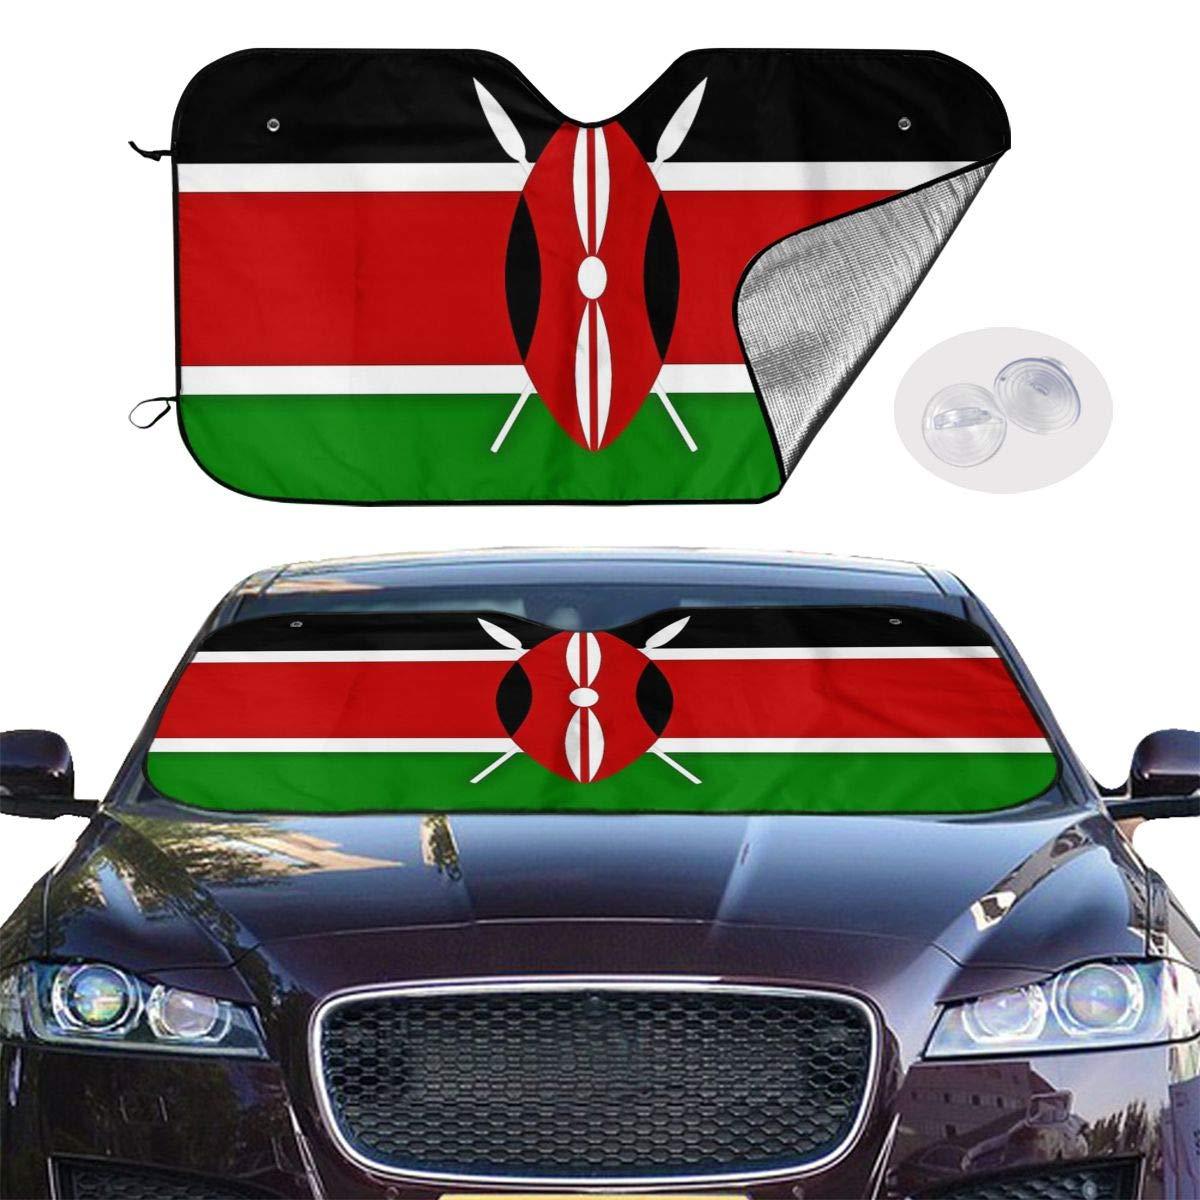 Kenya Flag Car Sunshade Window Windscreen Cover,Automotive Window Protector Sunshade Uv Sun and Heat Reflector for Car Truck SUV,Keep Your Vehicle Cool and Damage Free